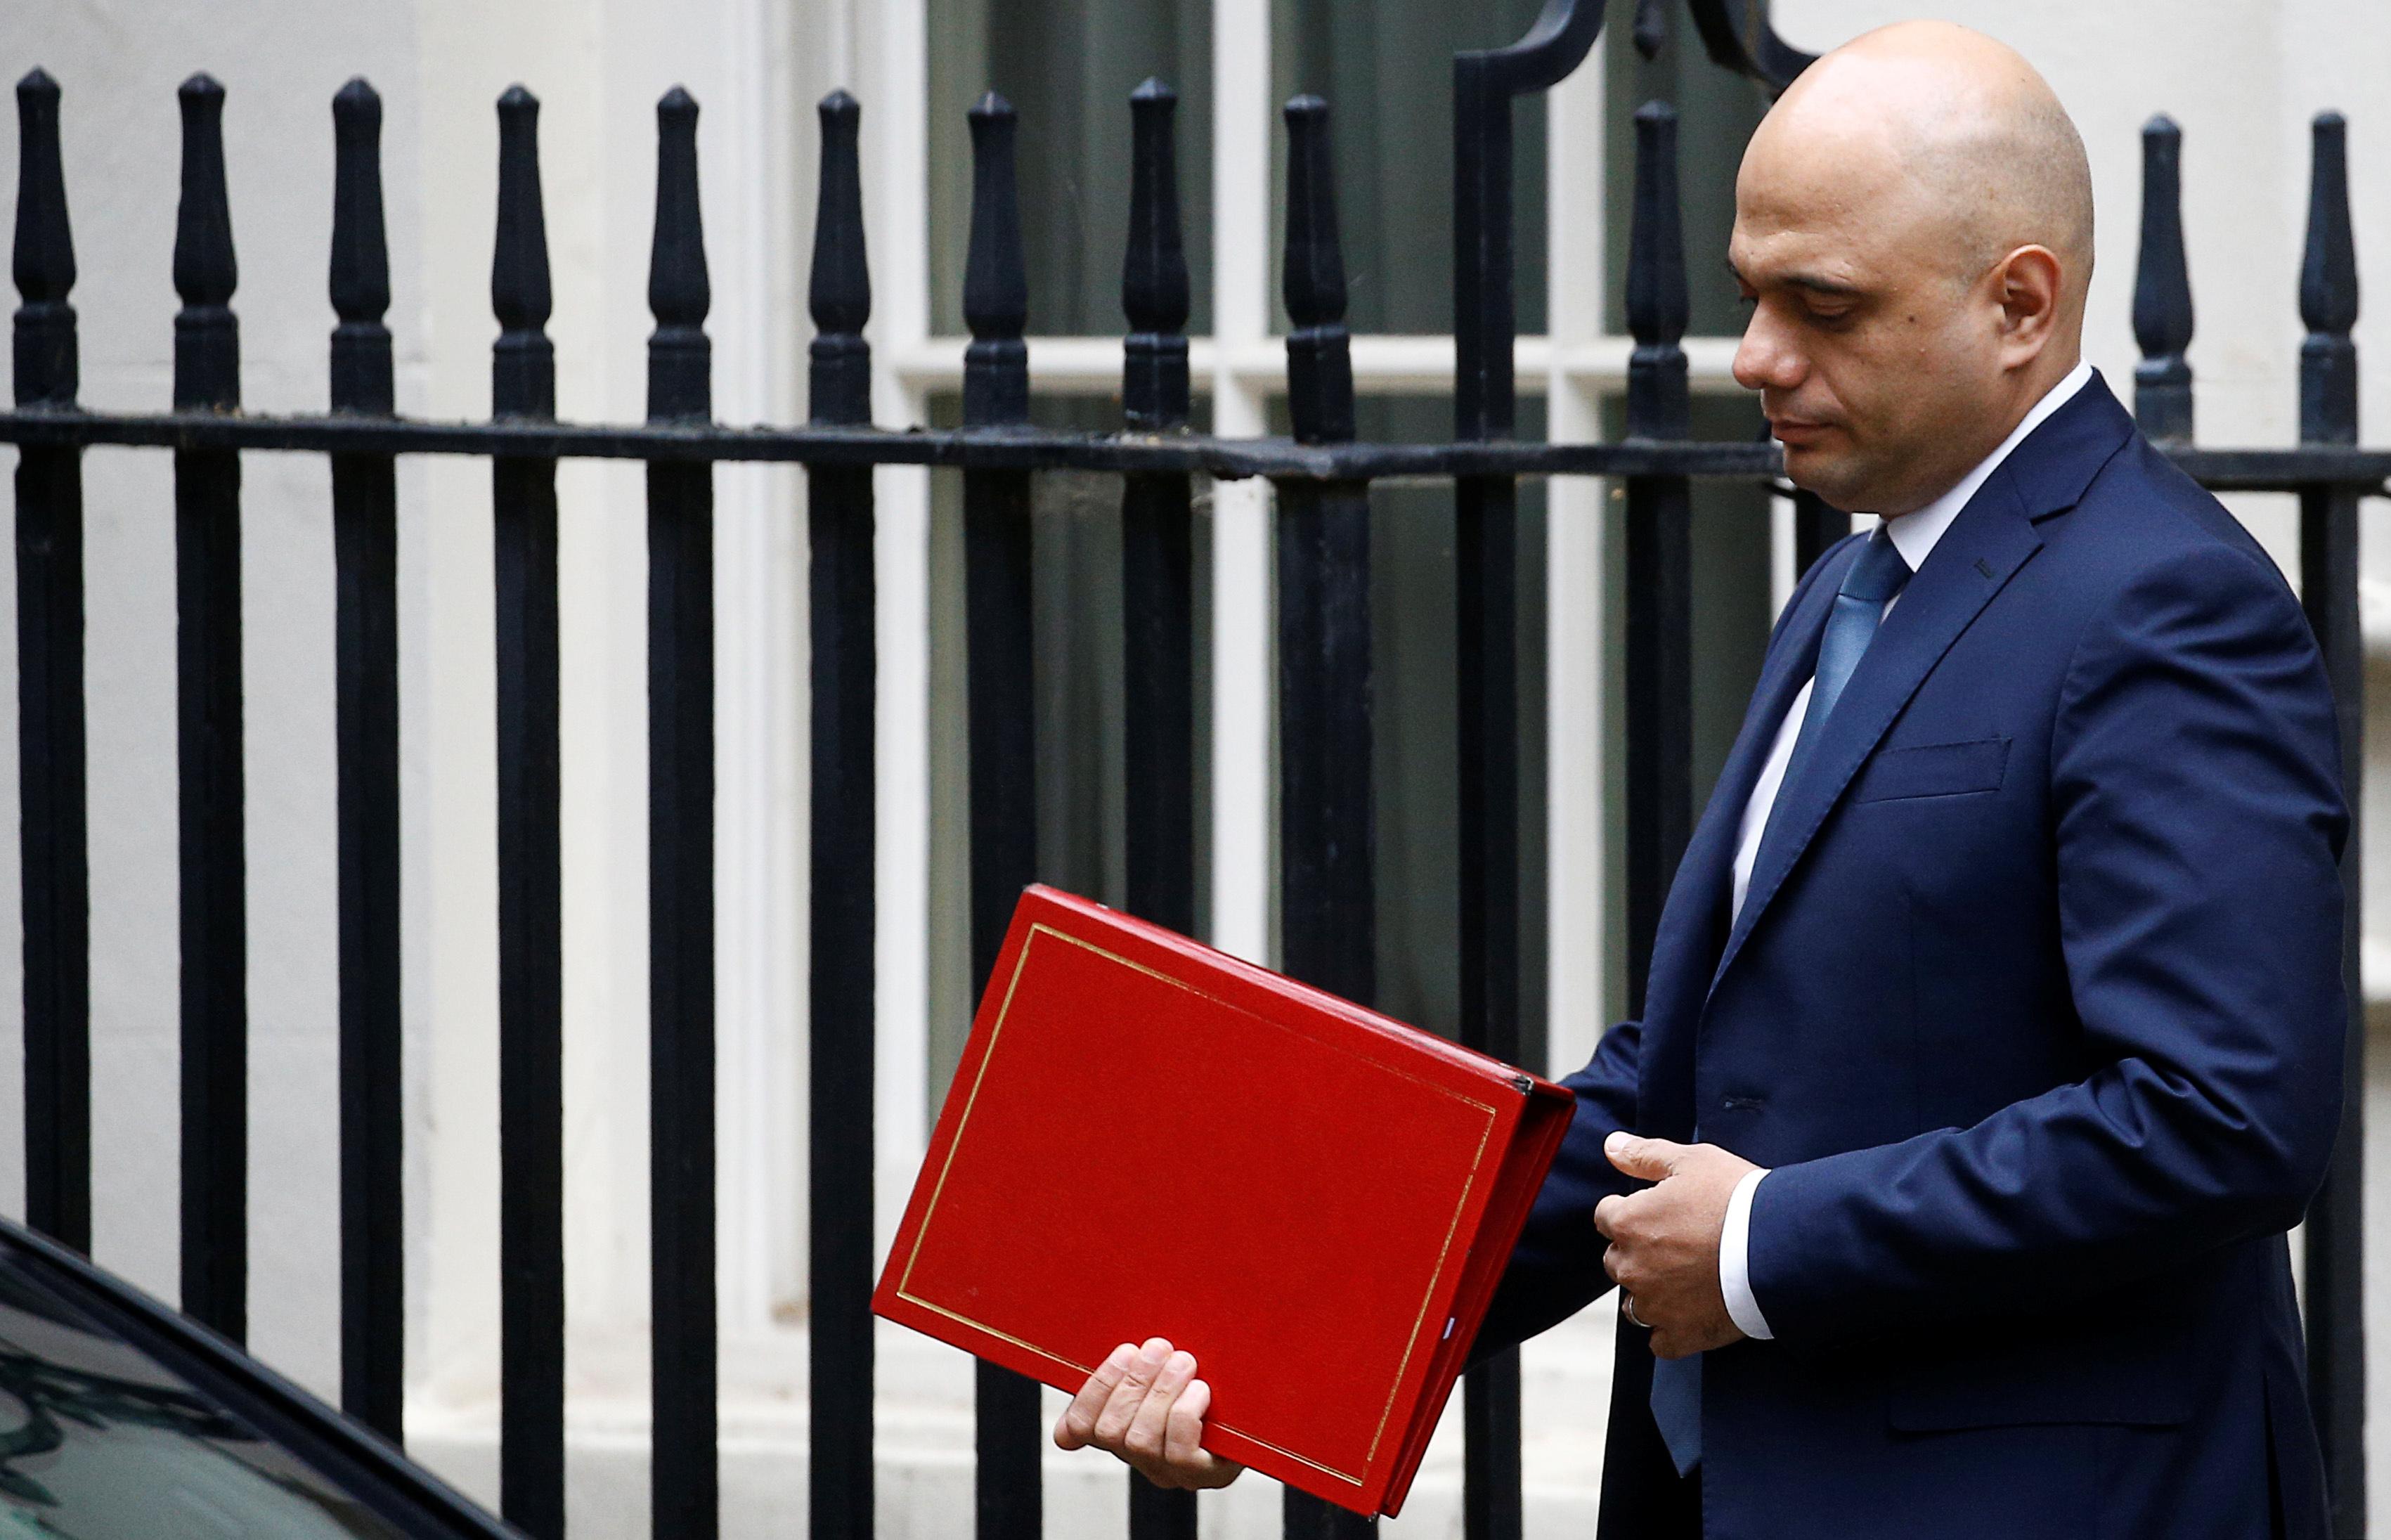 UK's Javid plans first post-Brexit budget on November 6